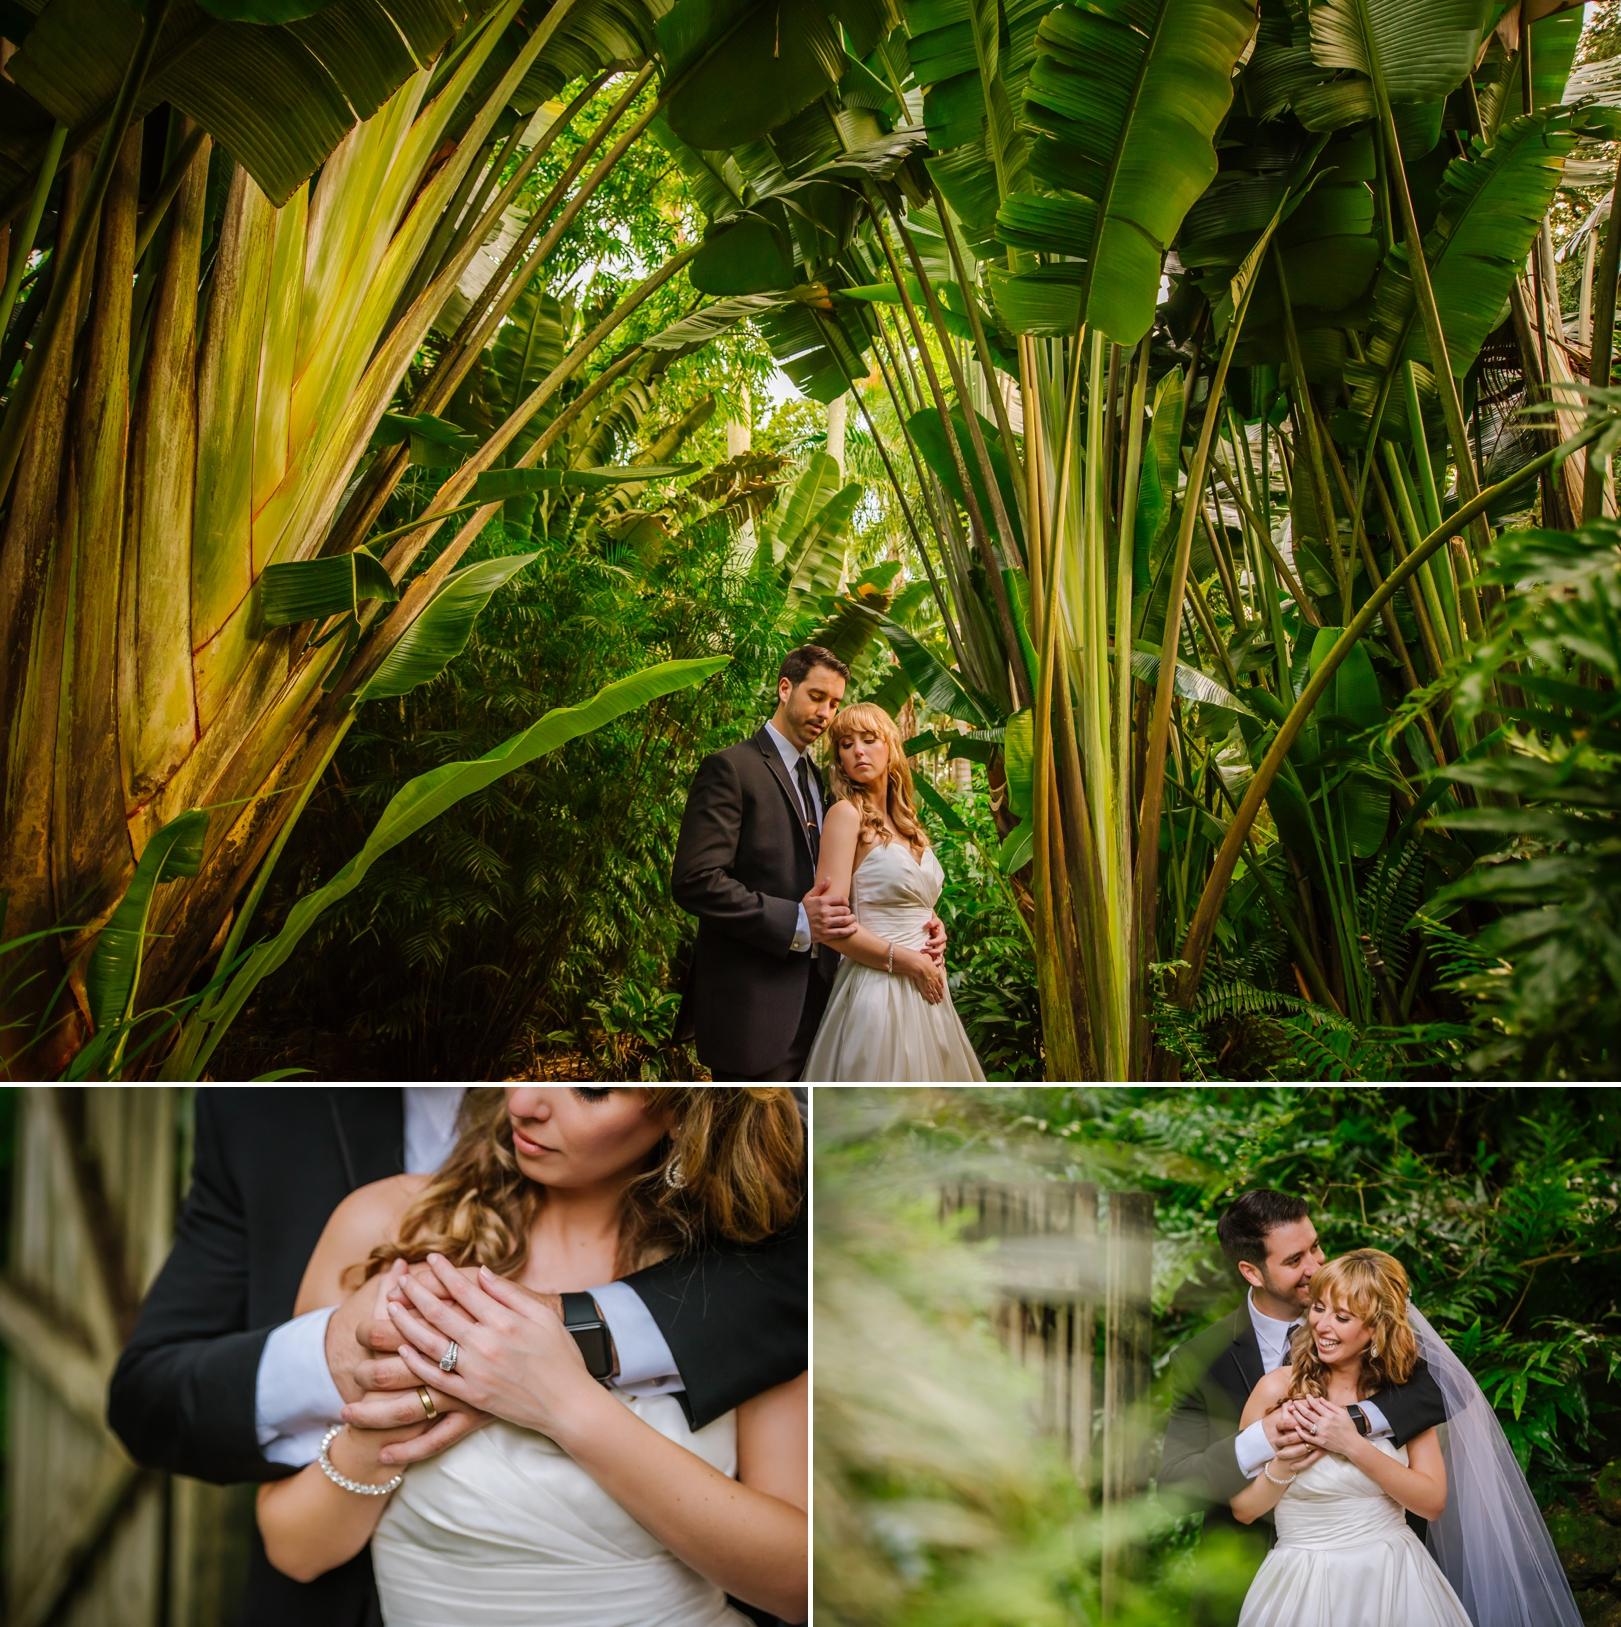 st-pete-hotel-zamora-sunken-gardens-rooftop-wedding-photography_0014.jpg